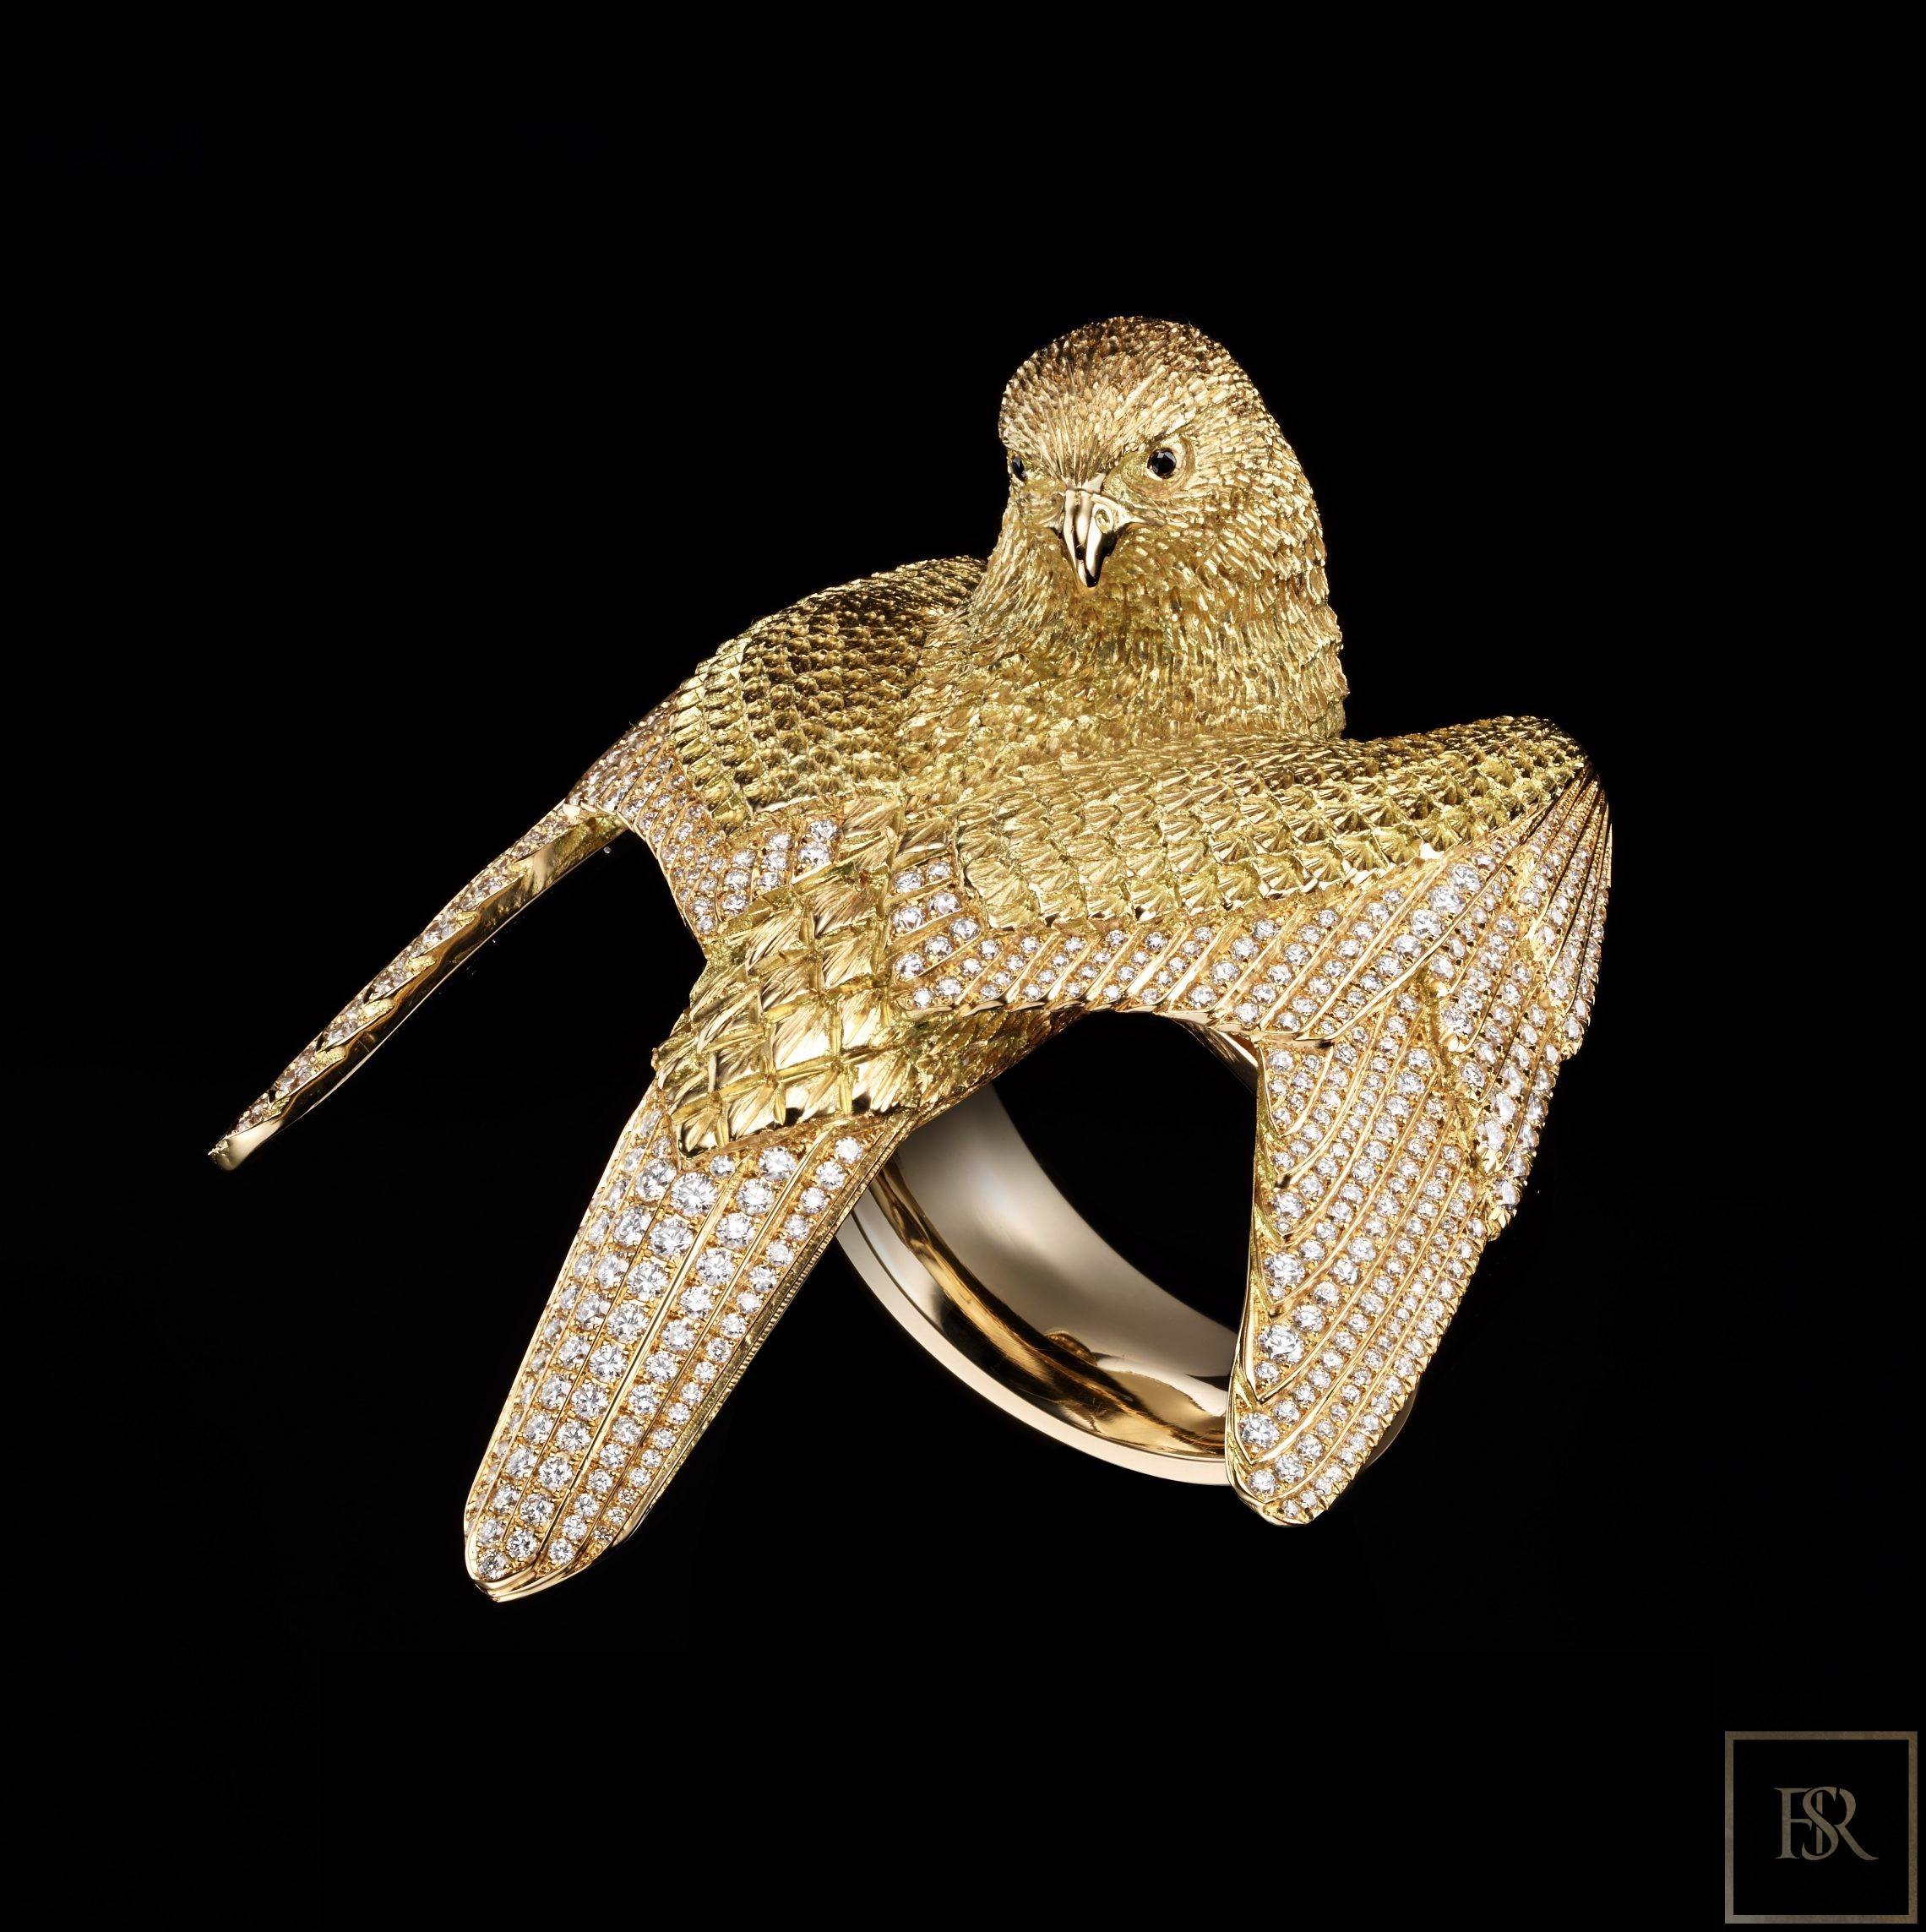 Masterpiece Gold & Diamonds FALCON Ring - GIBERG for sale For Super Rich